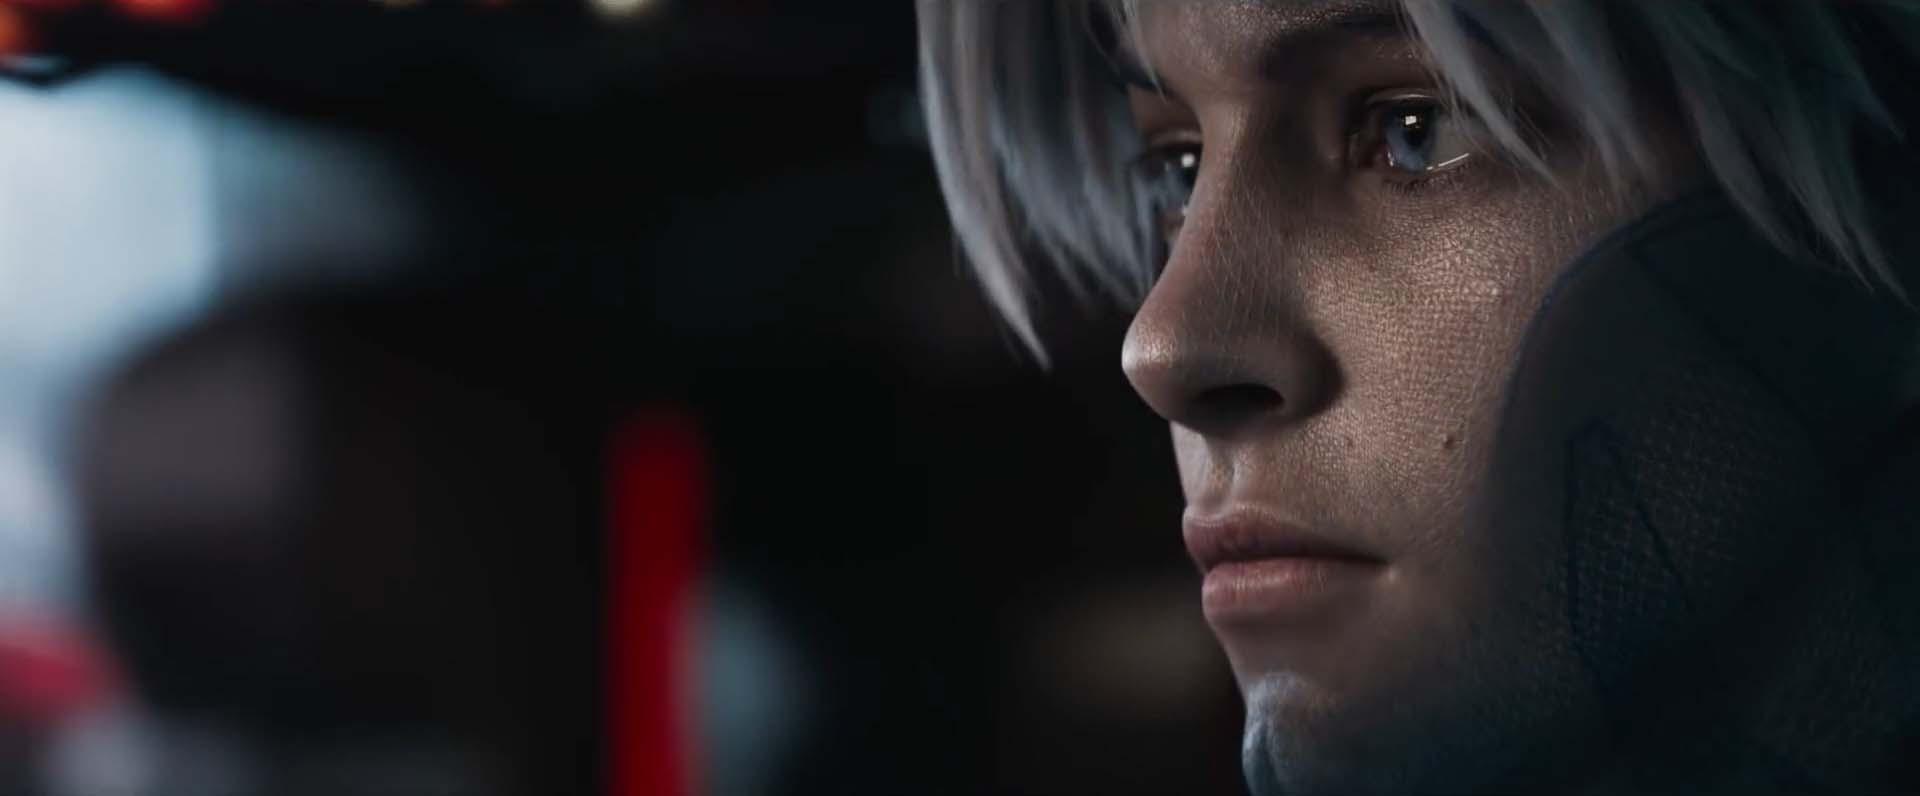 Ready-Player-One-Trailer-2-09.jpg